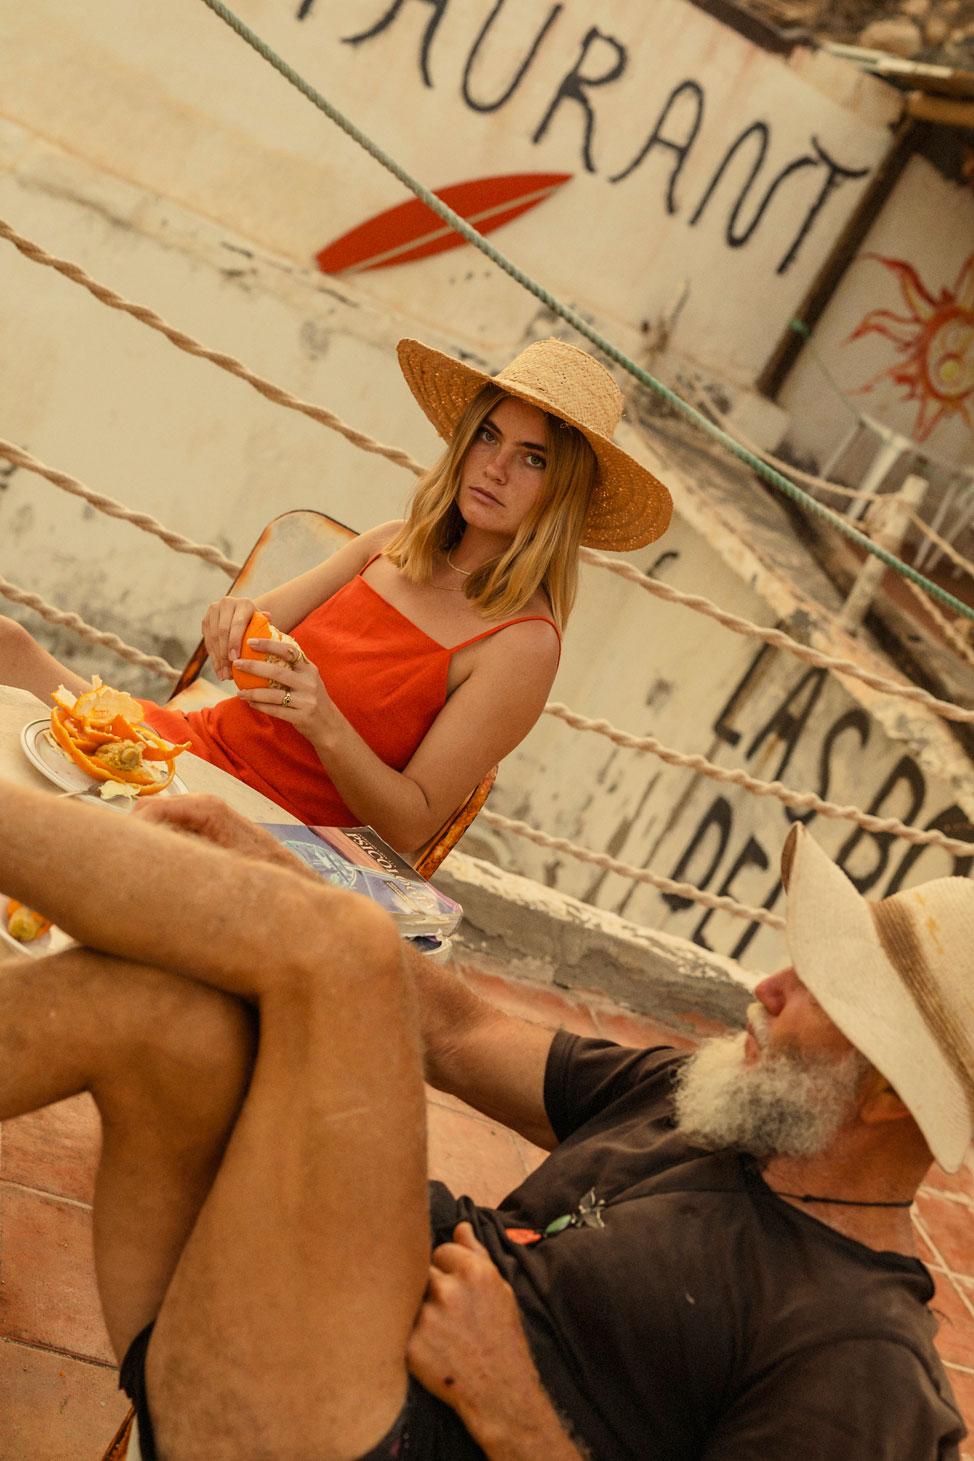 Nueva colección de ropa de Aiga Store | Macaronesia Fuerteventura